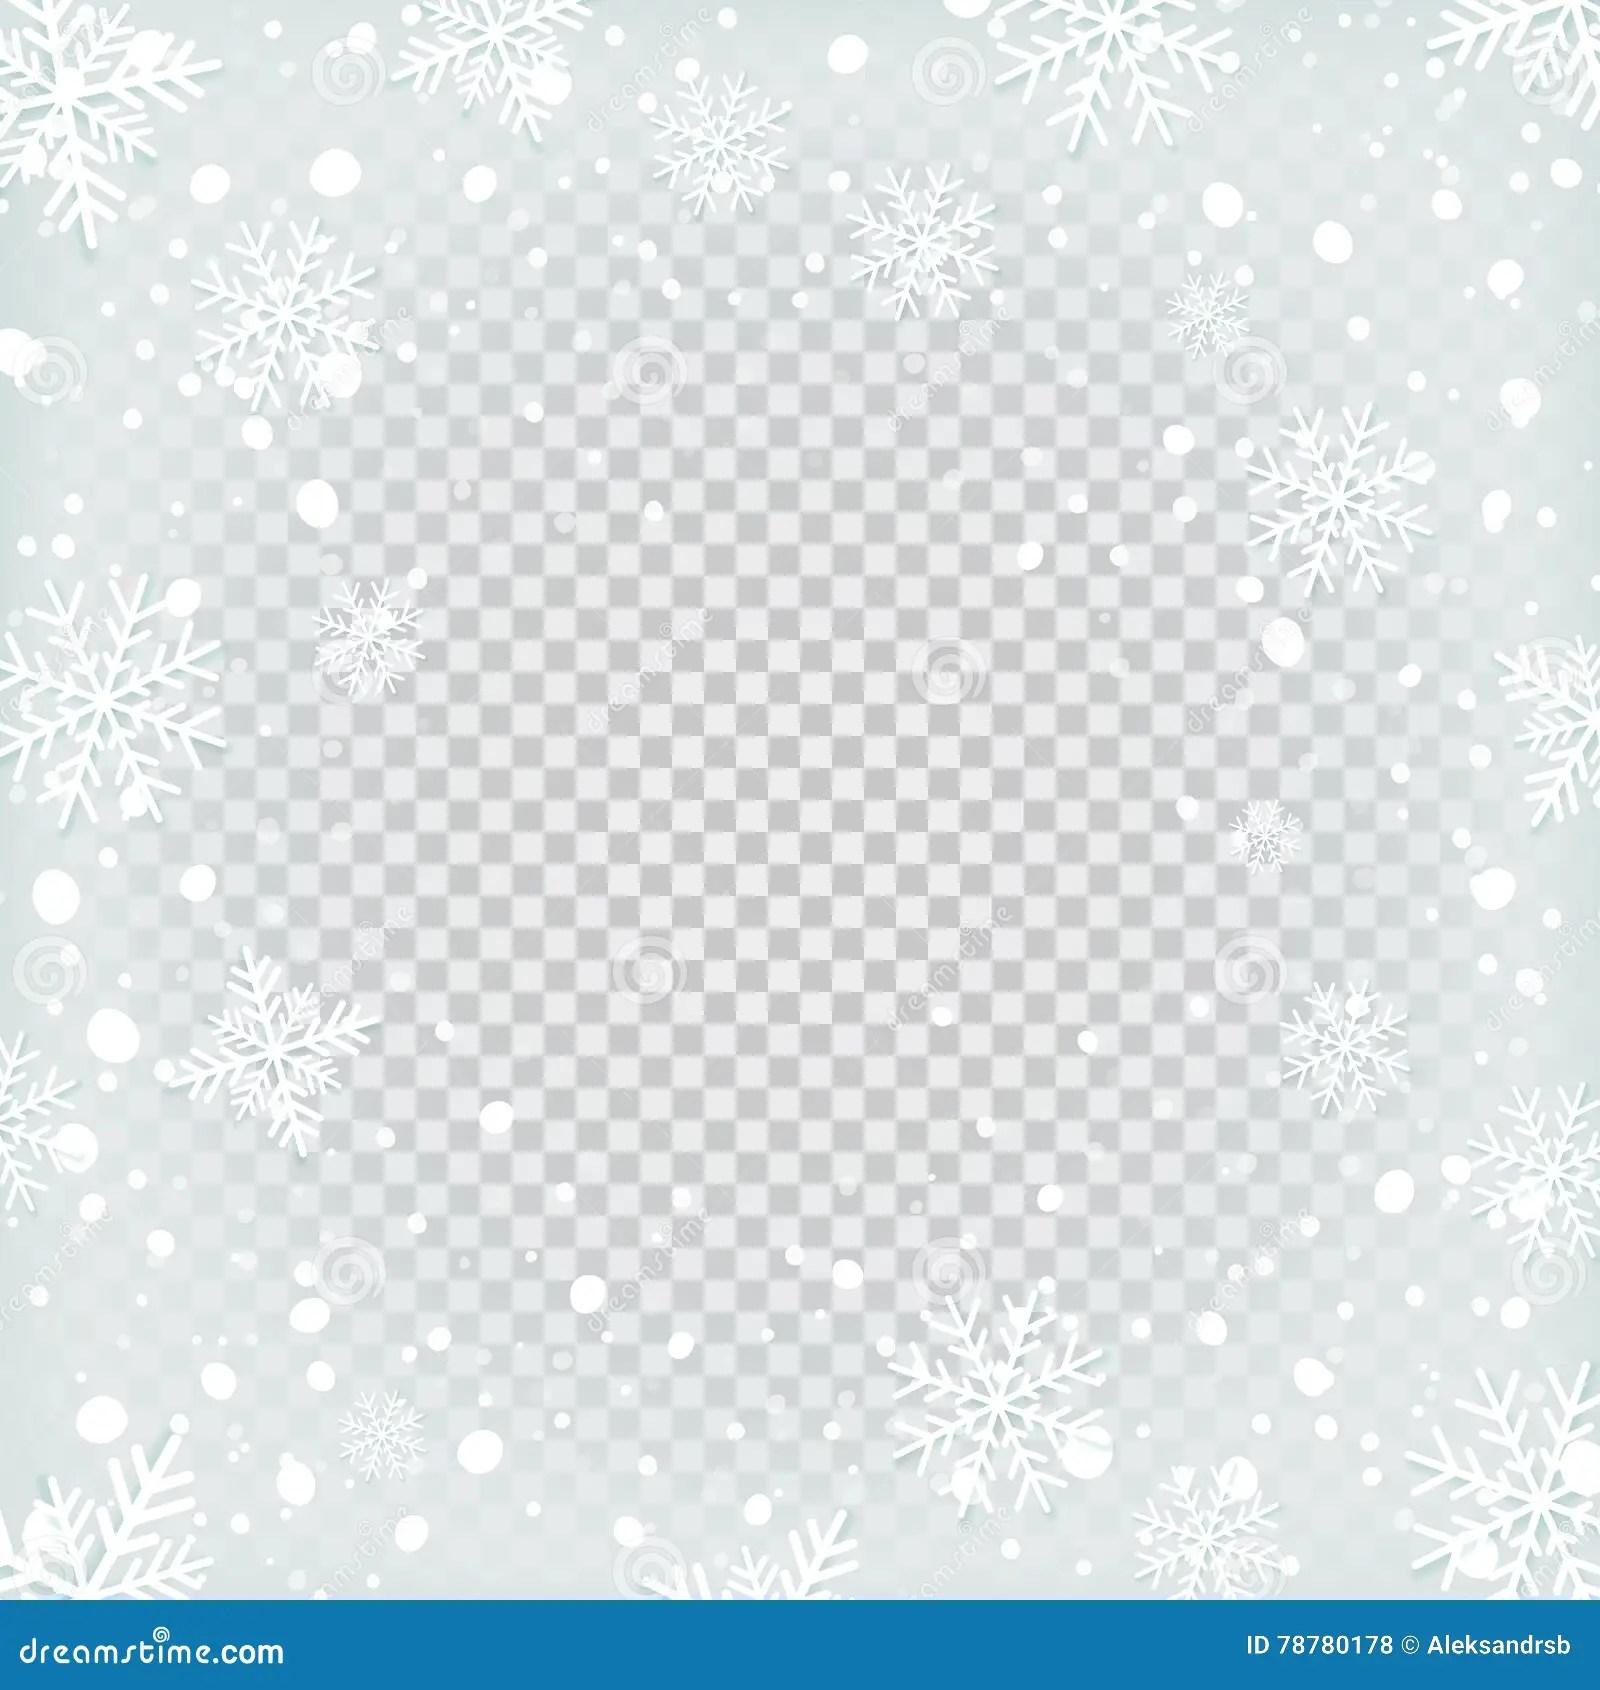 Transparent Snow Background Stock Vector